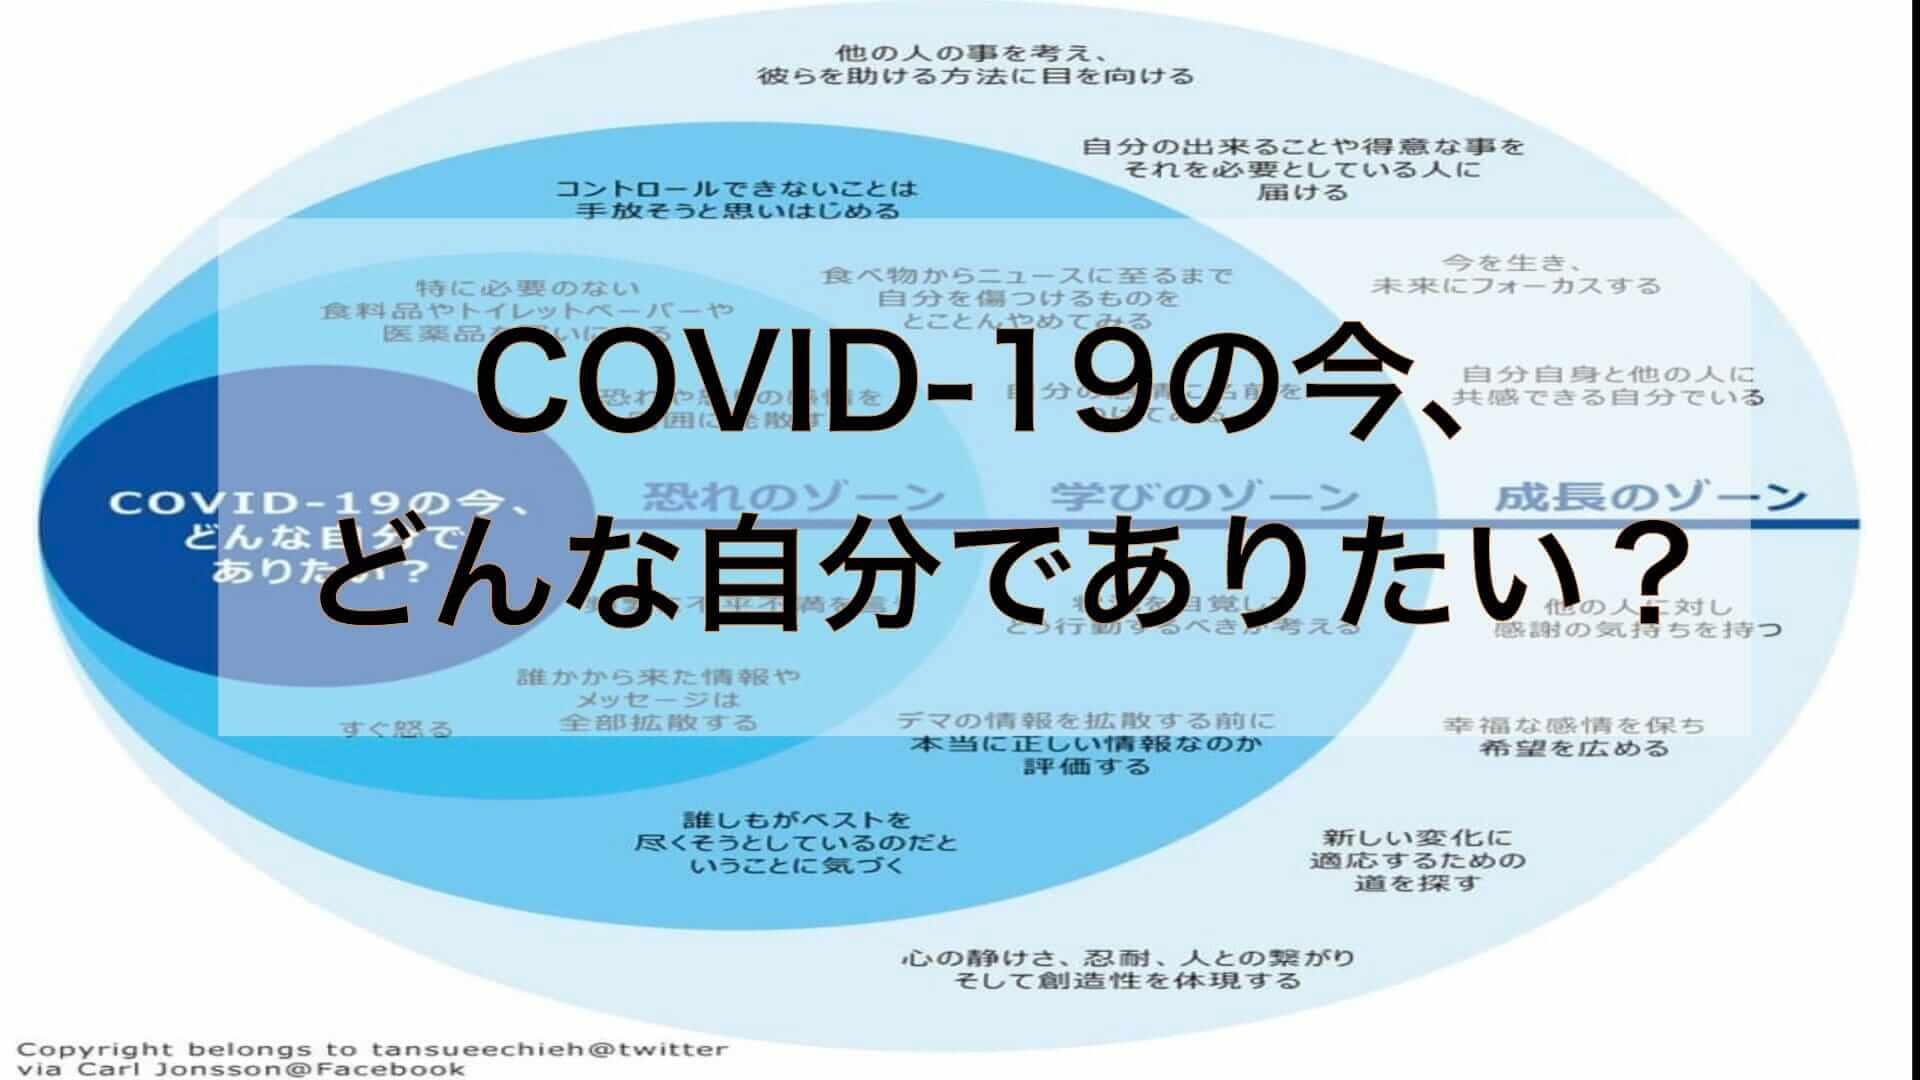 「COVID-19の今、どんな自分でありたい?」を考える